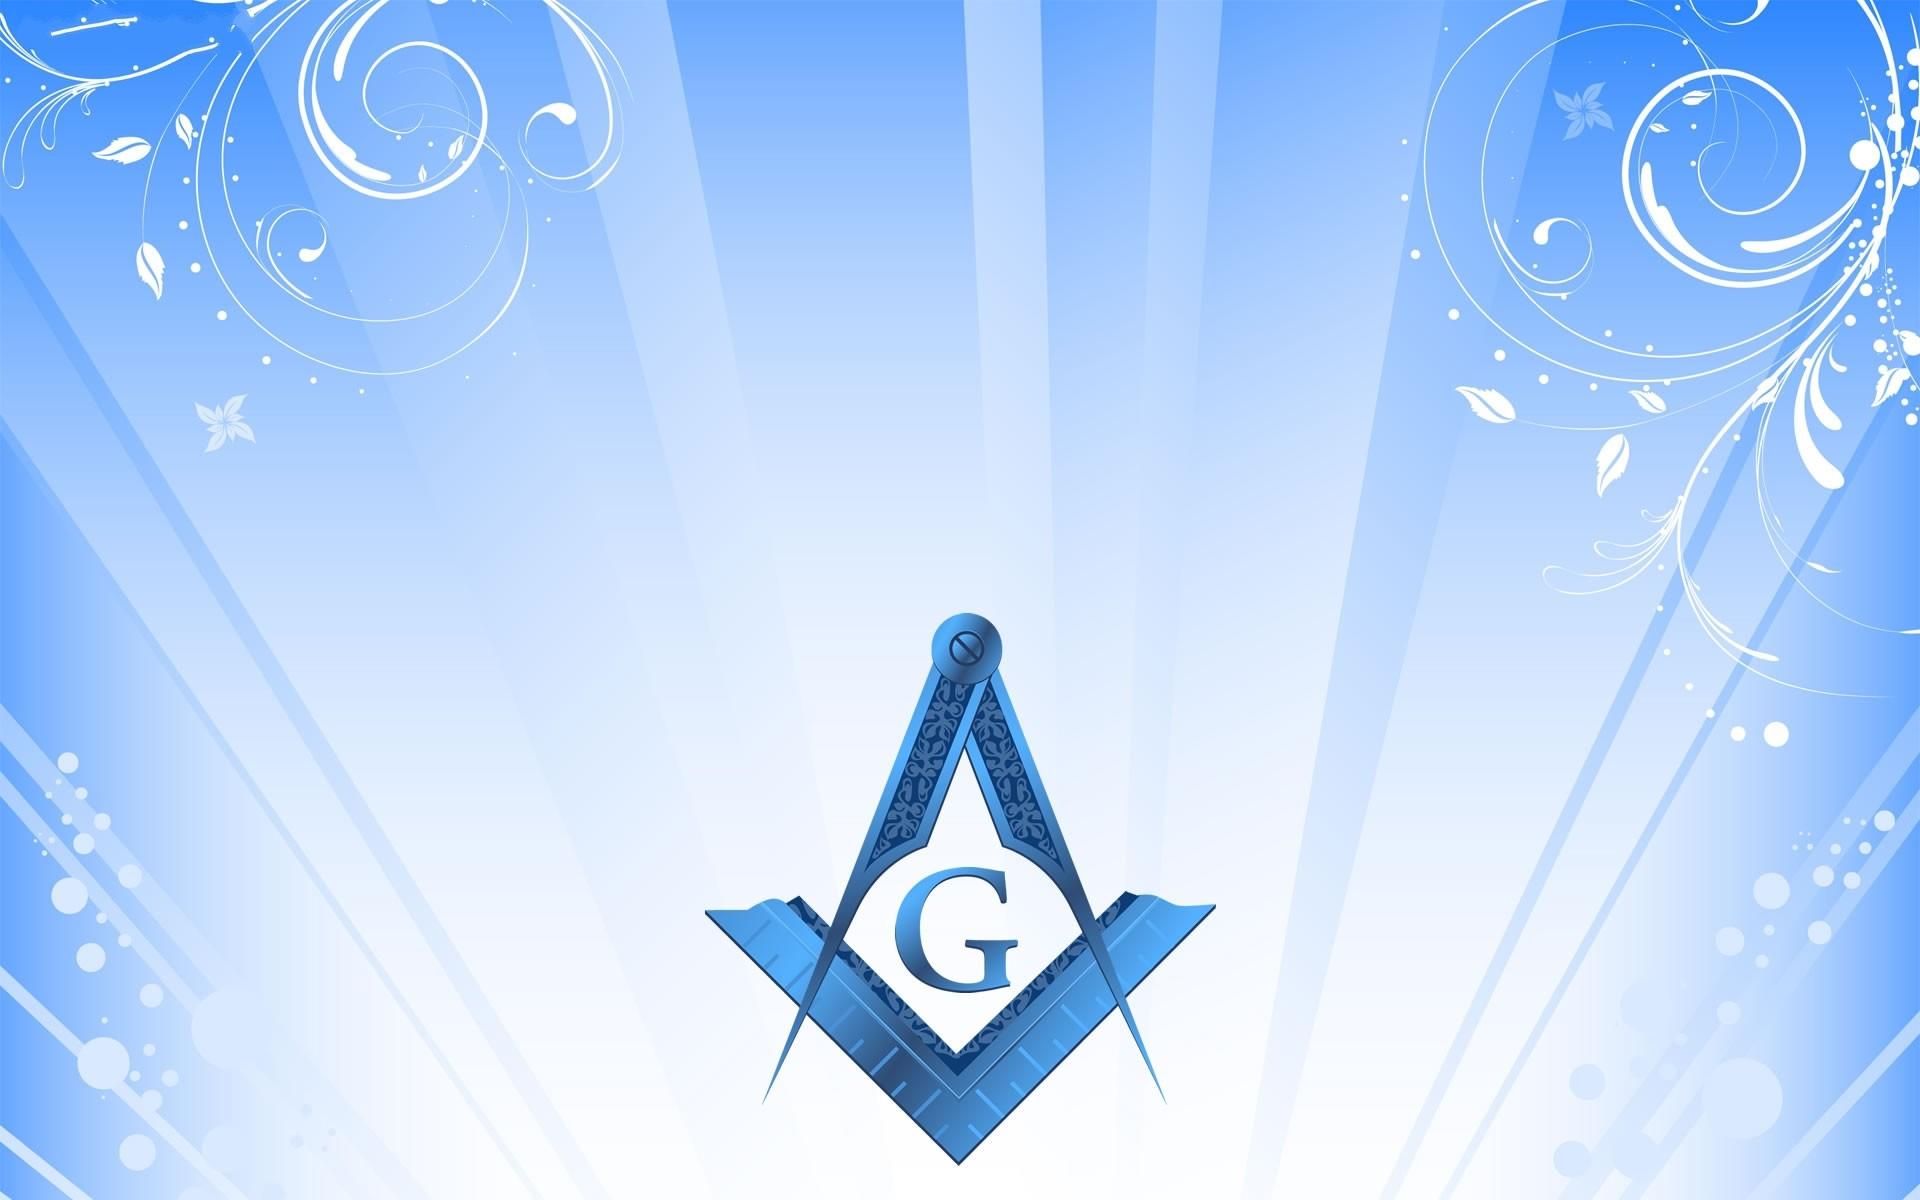 Download Free Masonic Backgrounds | PixelsTalk.Net